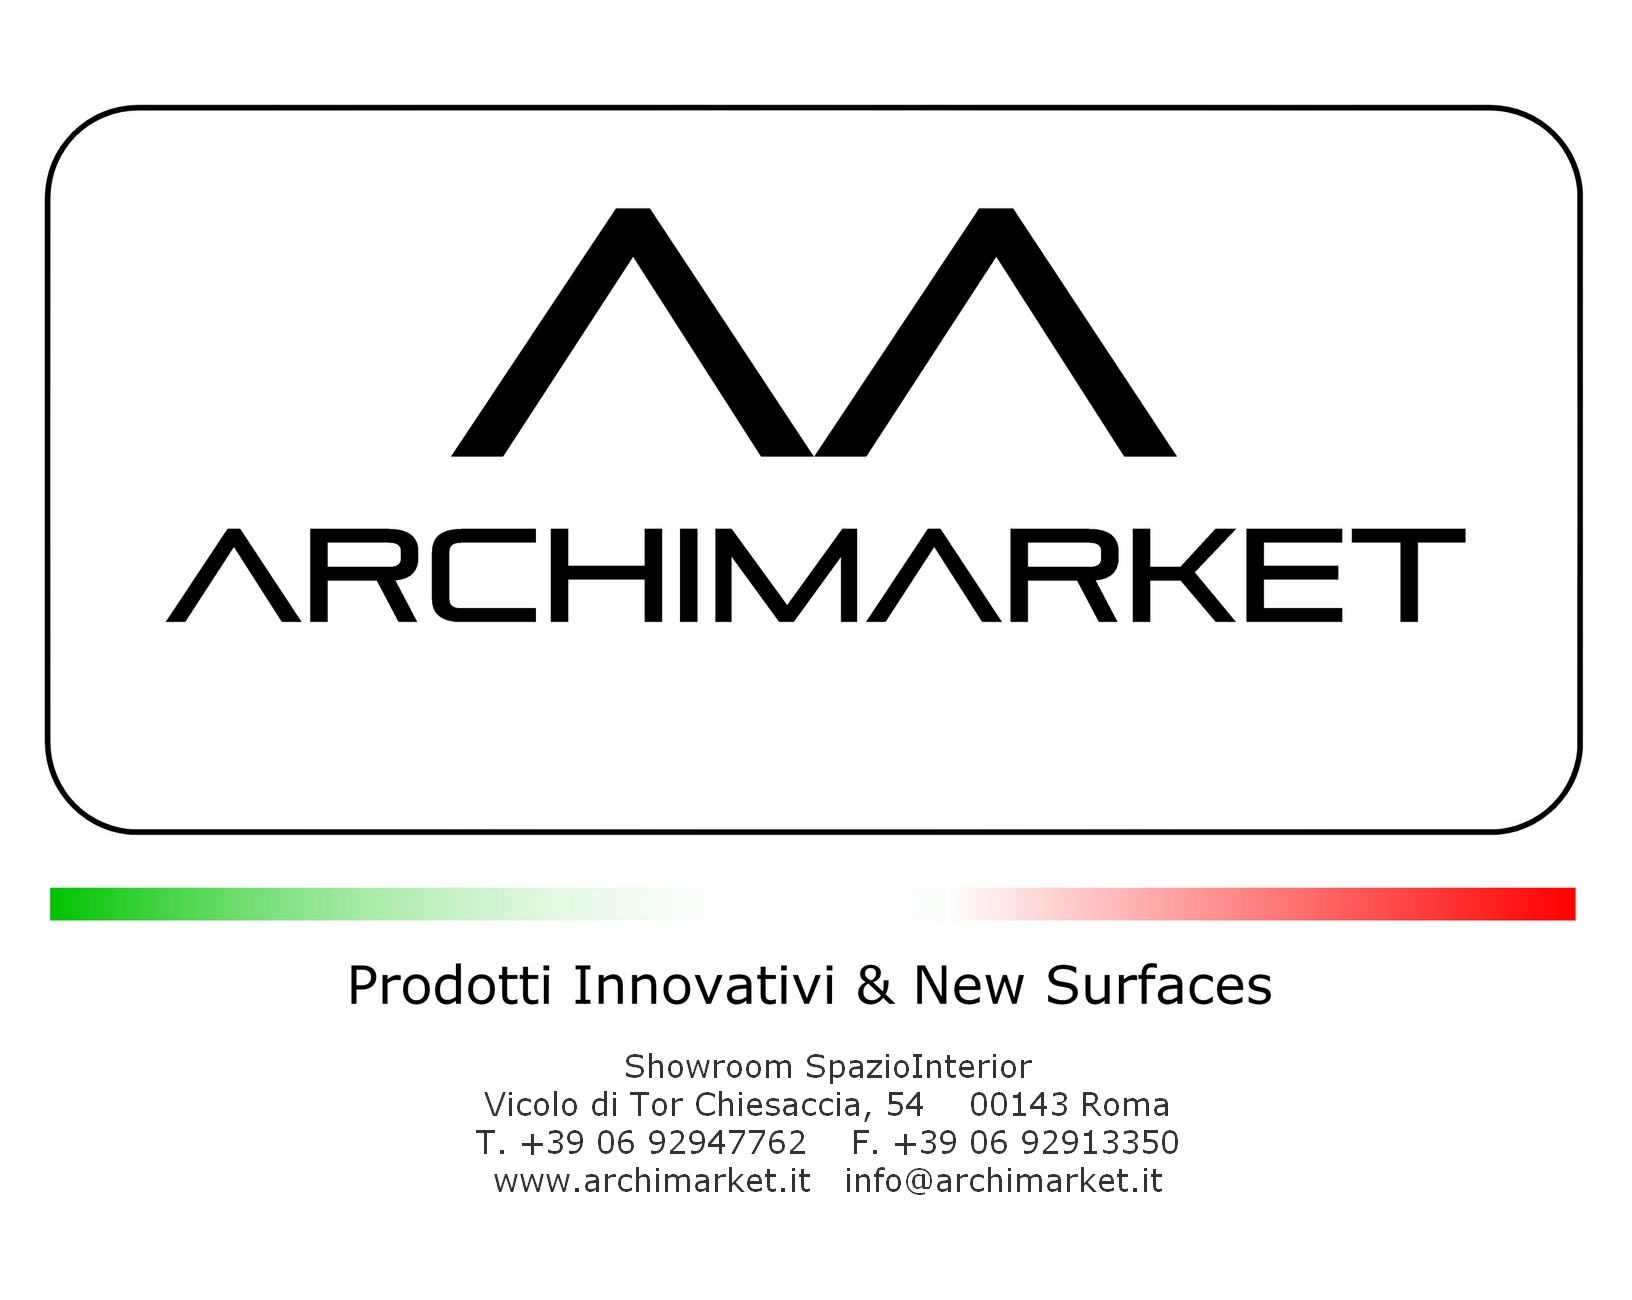 Archimarket